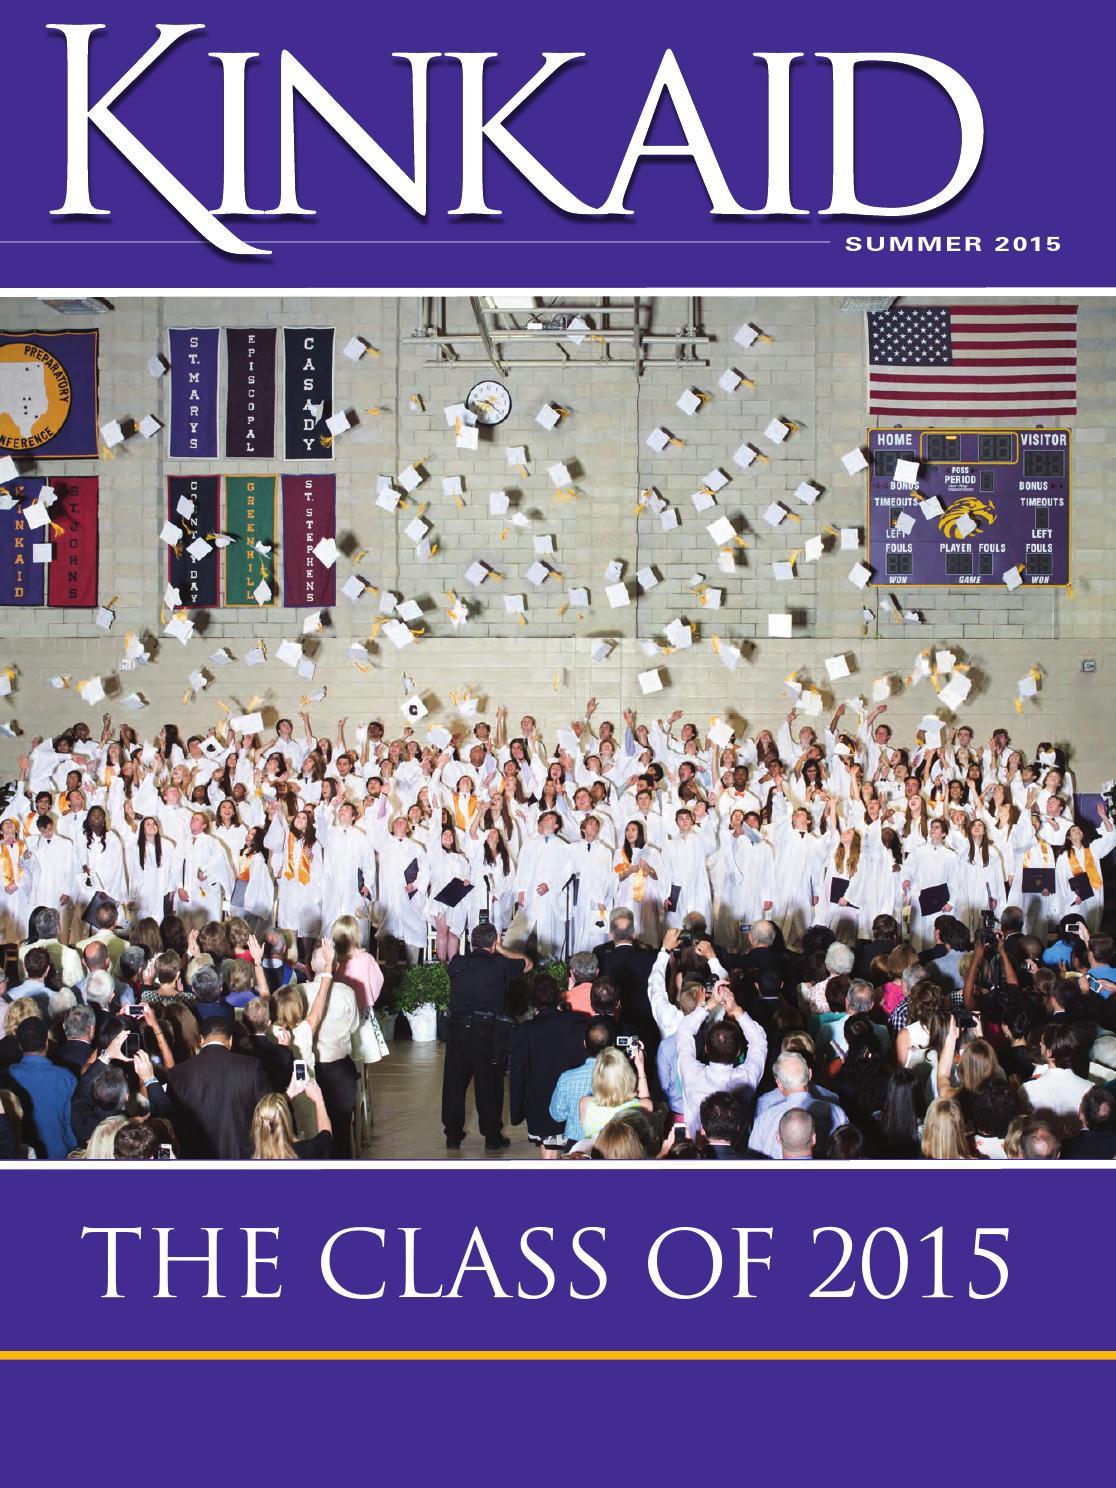 Kinkaid summer magazine 2015 by the kinkaid school issuu fandeluxe Gallery